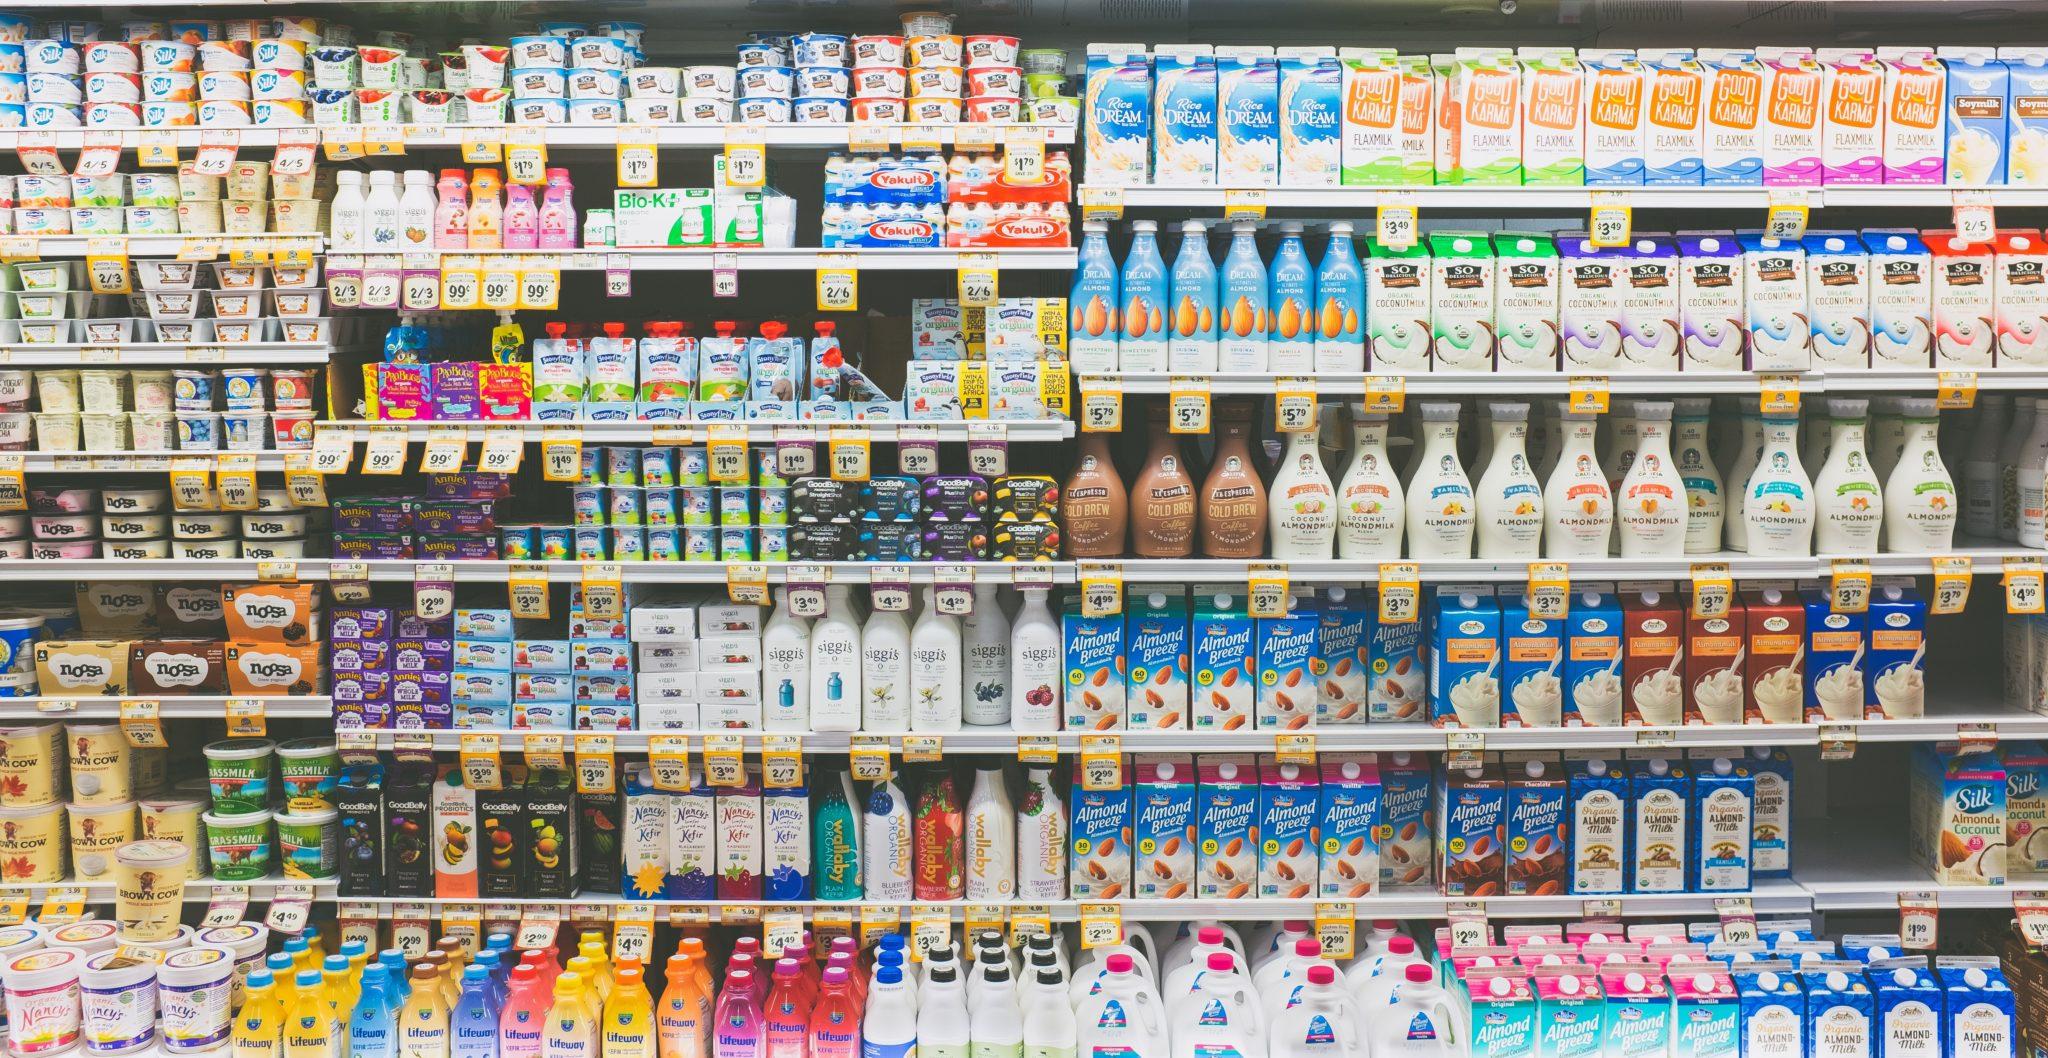 la-leche-alimento-boca-todos-mitos-verdades